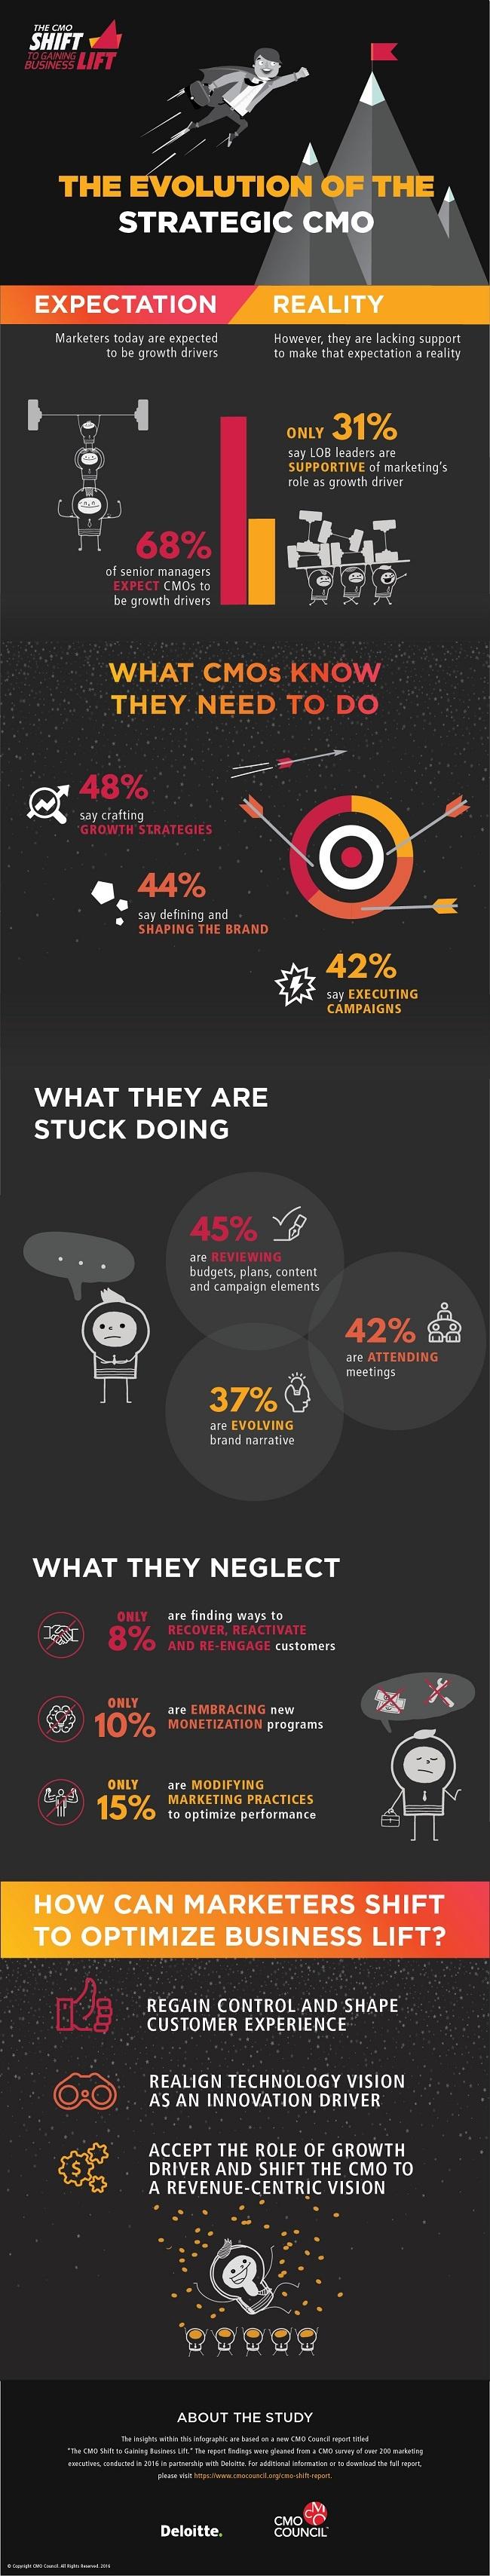 CMO_Shift_Infographic.jpg